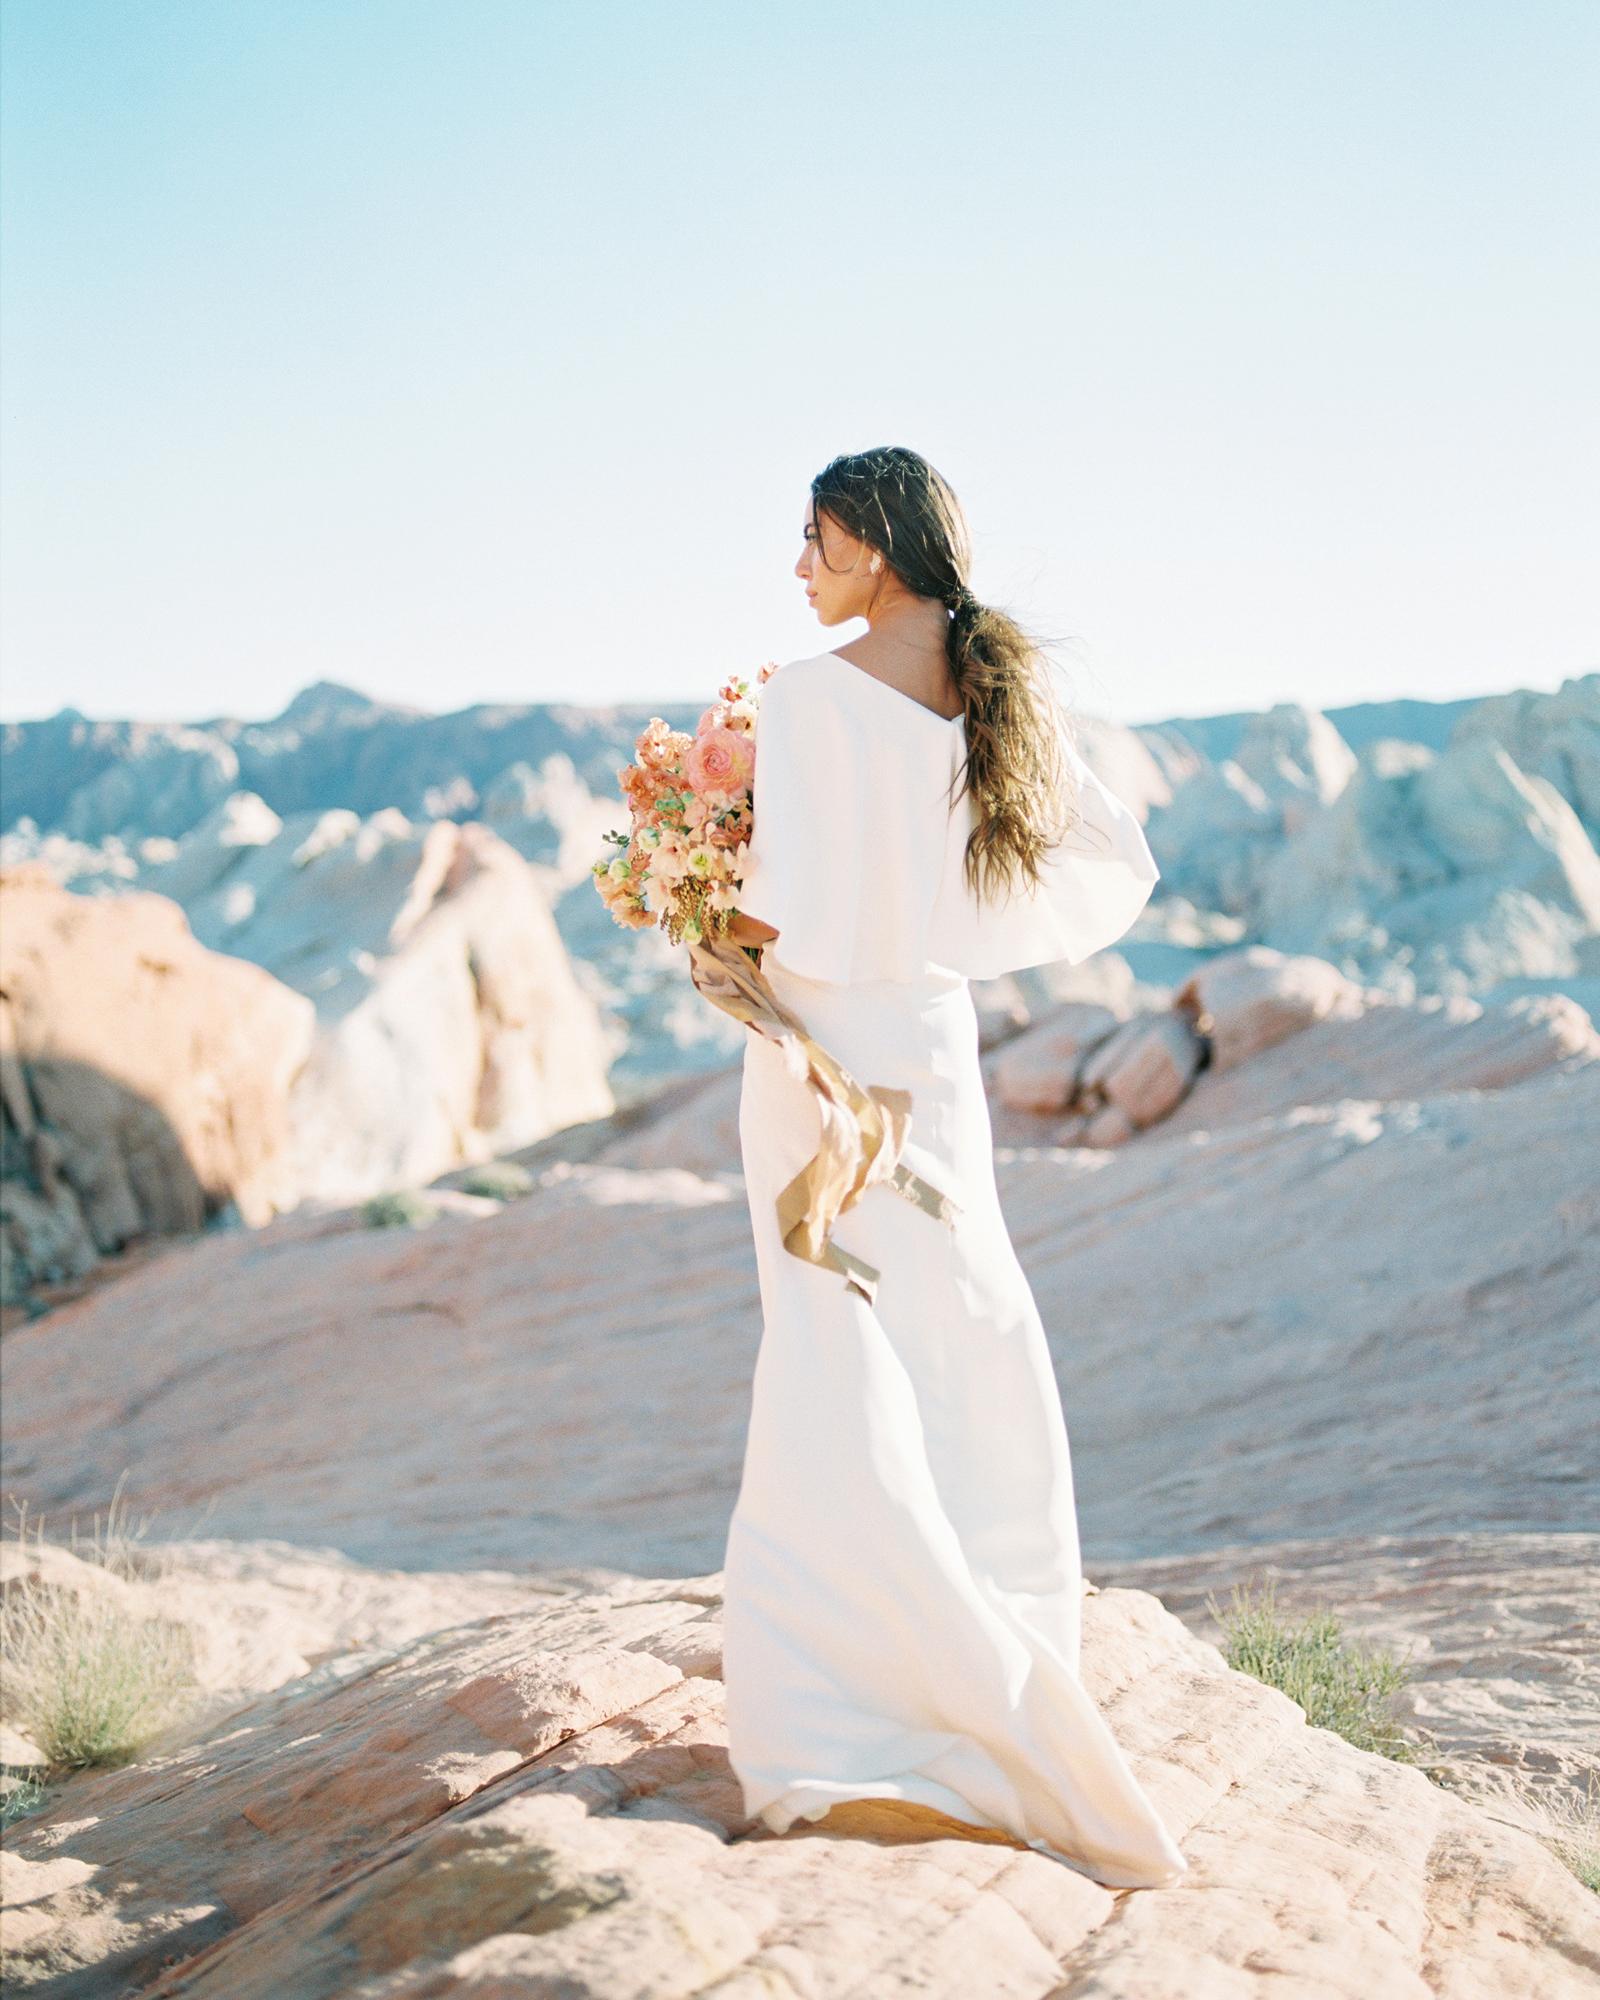 destination wedding dress standing on desert rocks